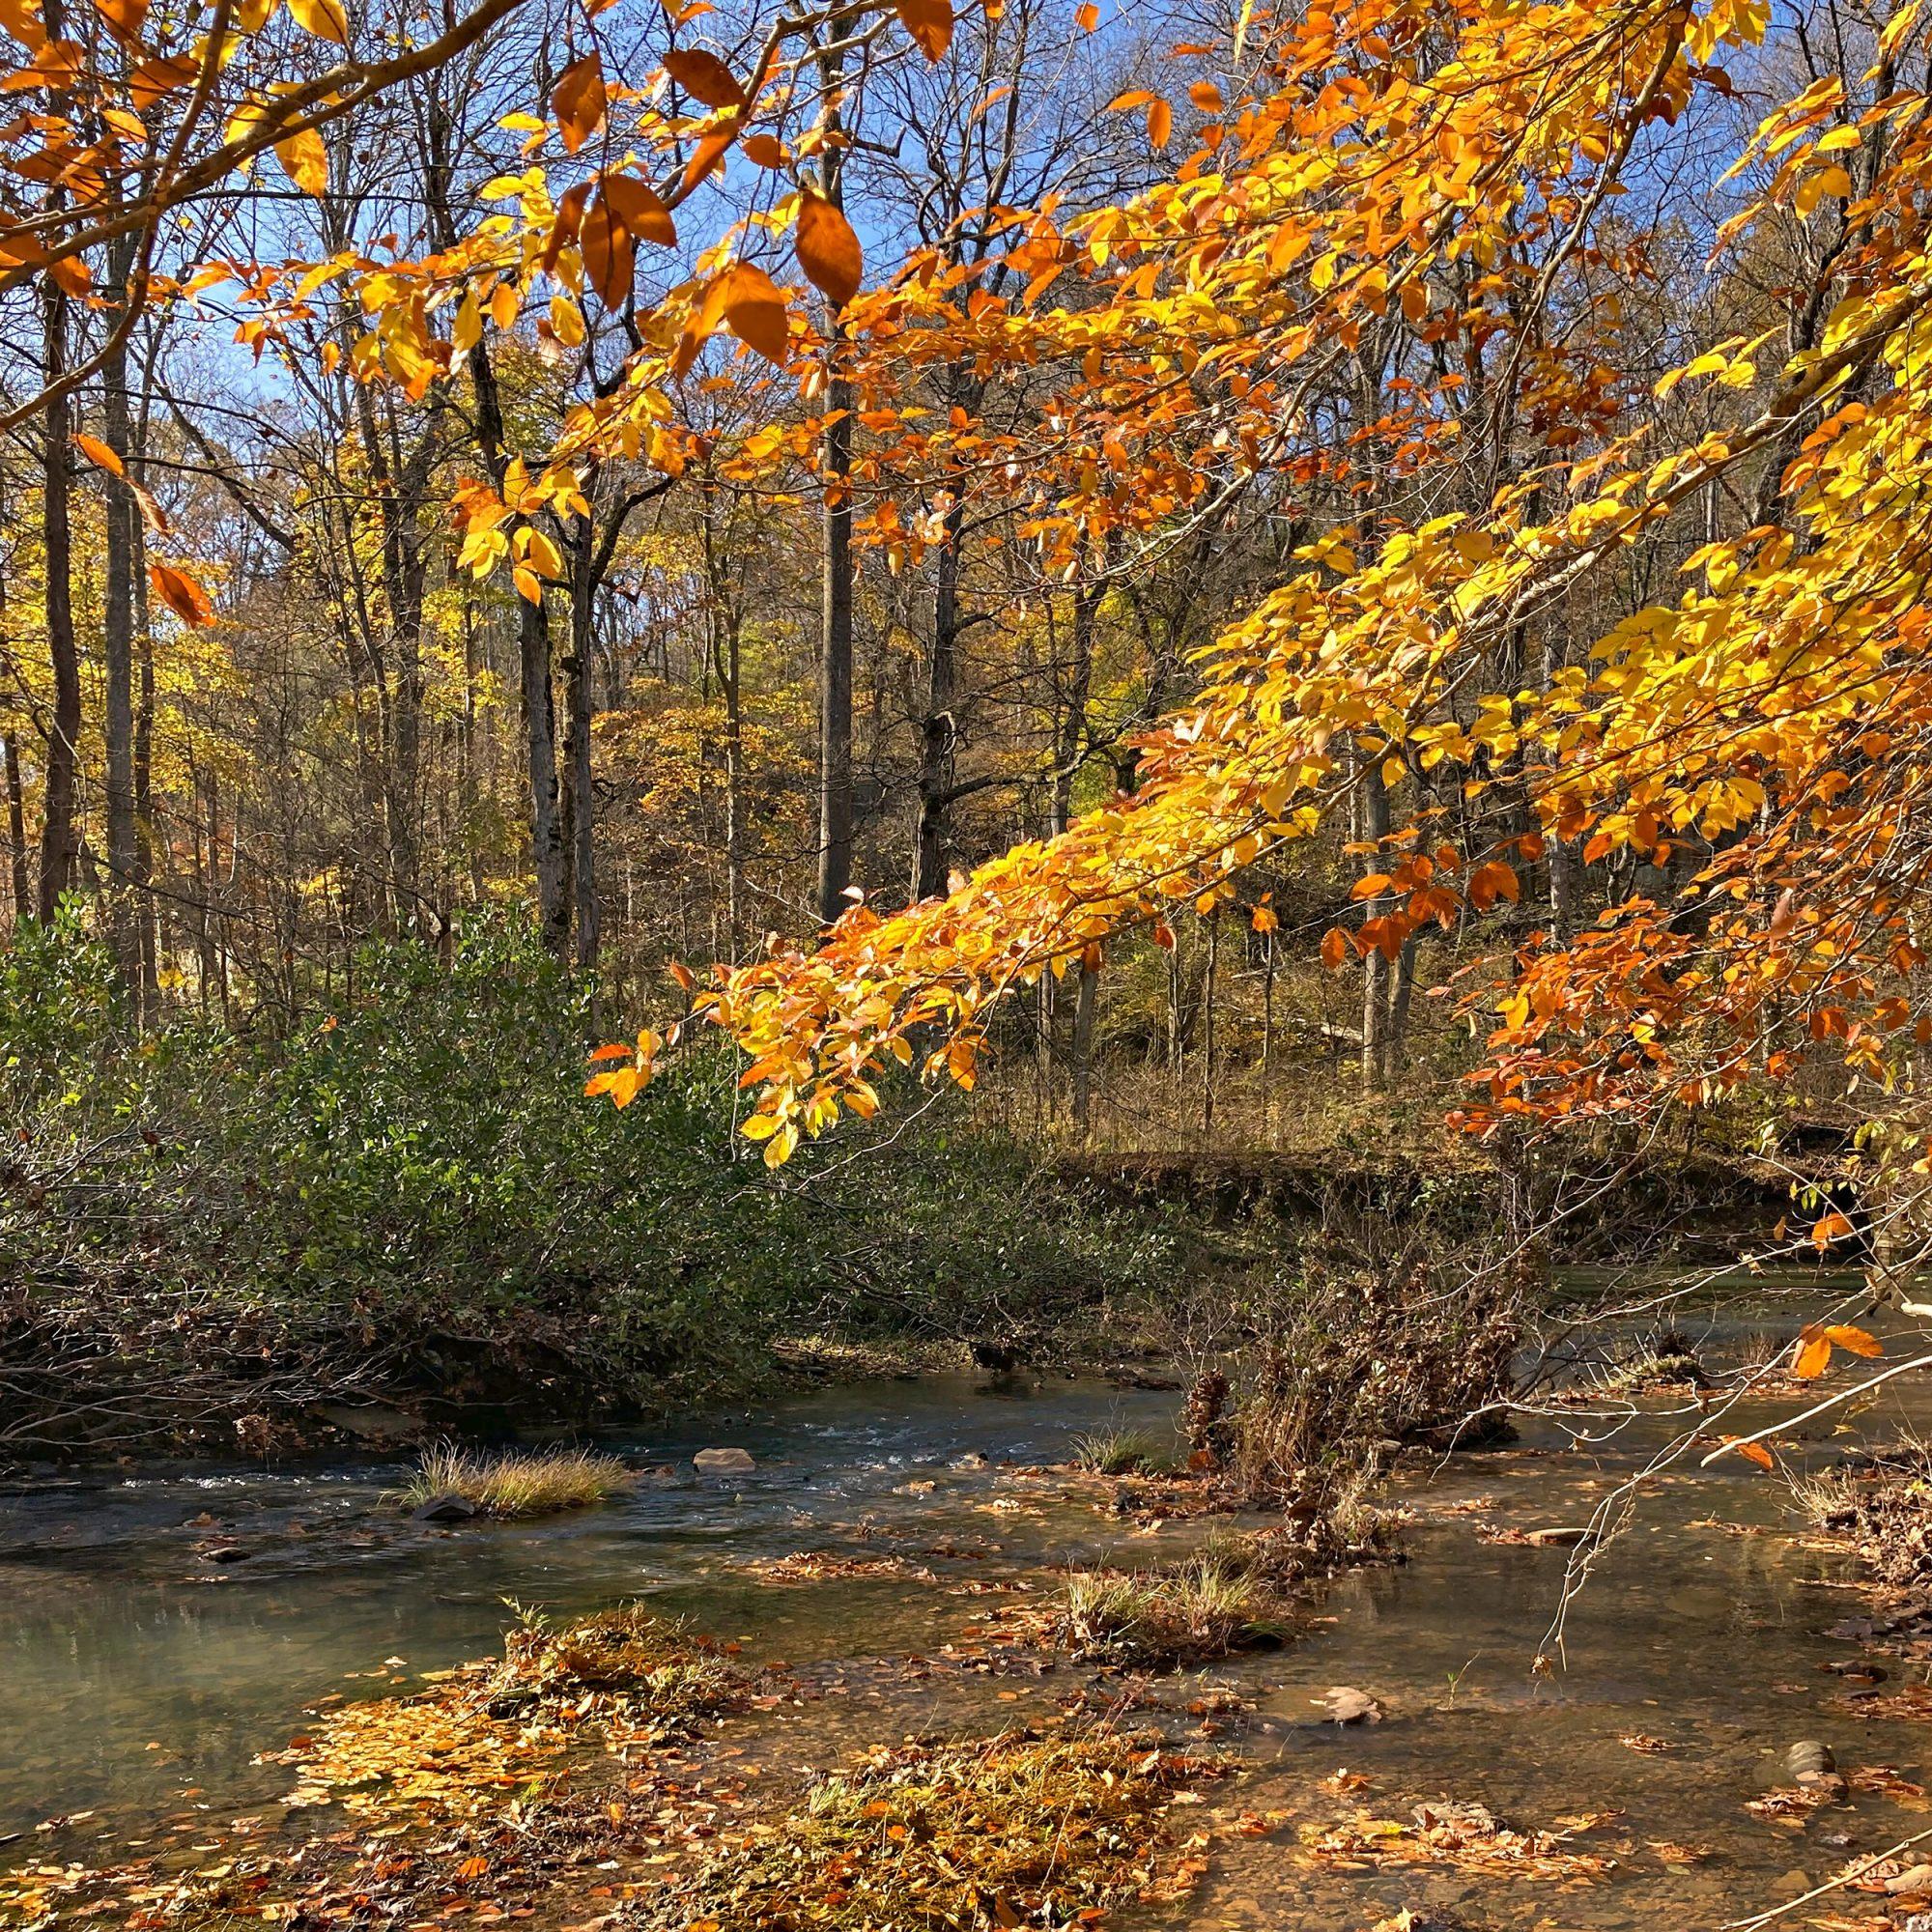 Fall staff road trips southern Illinois